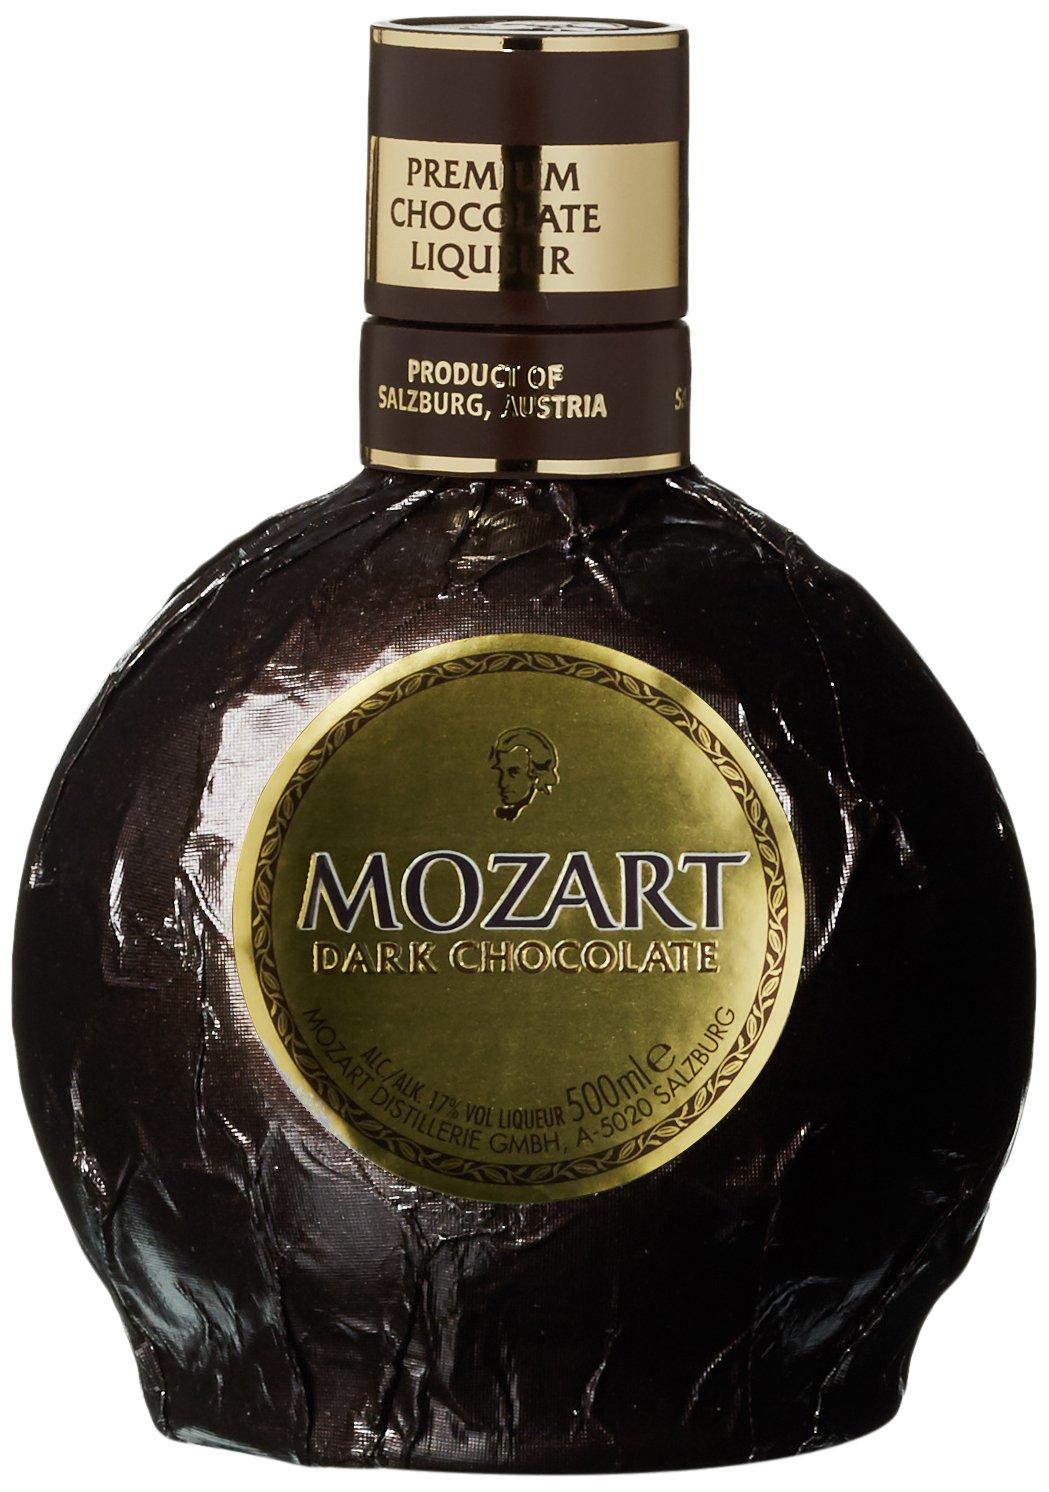 Mozart-Dark-Chocolate-Schokoladenlikr-1-x-05-l